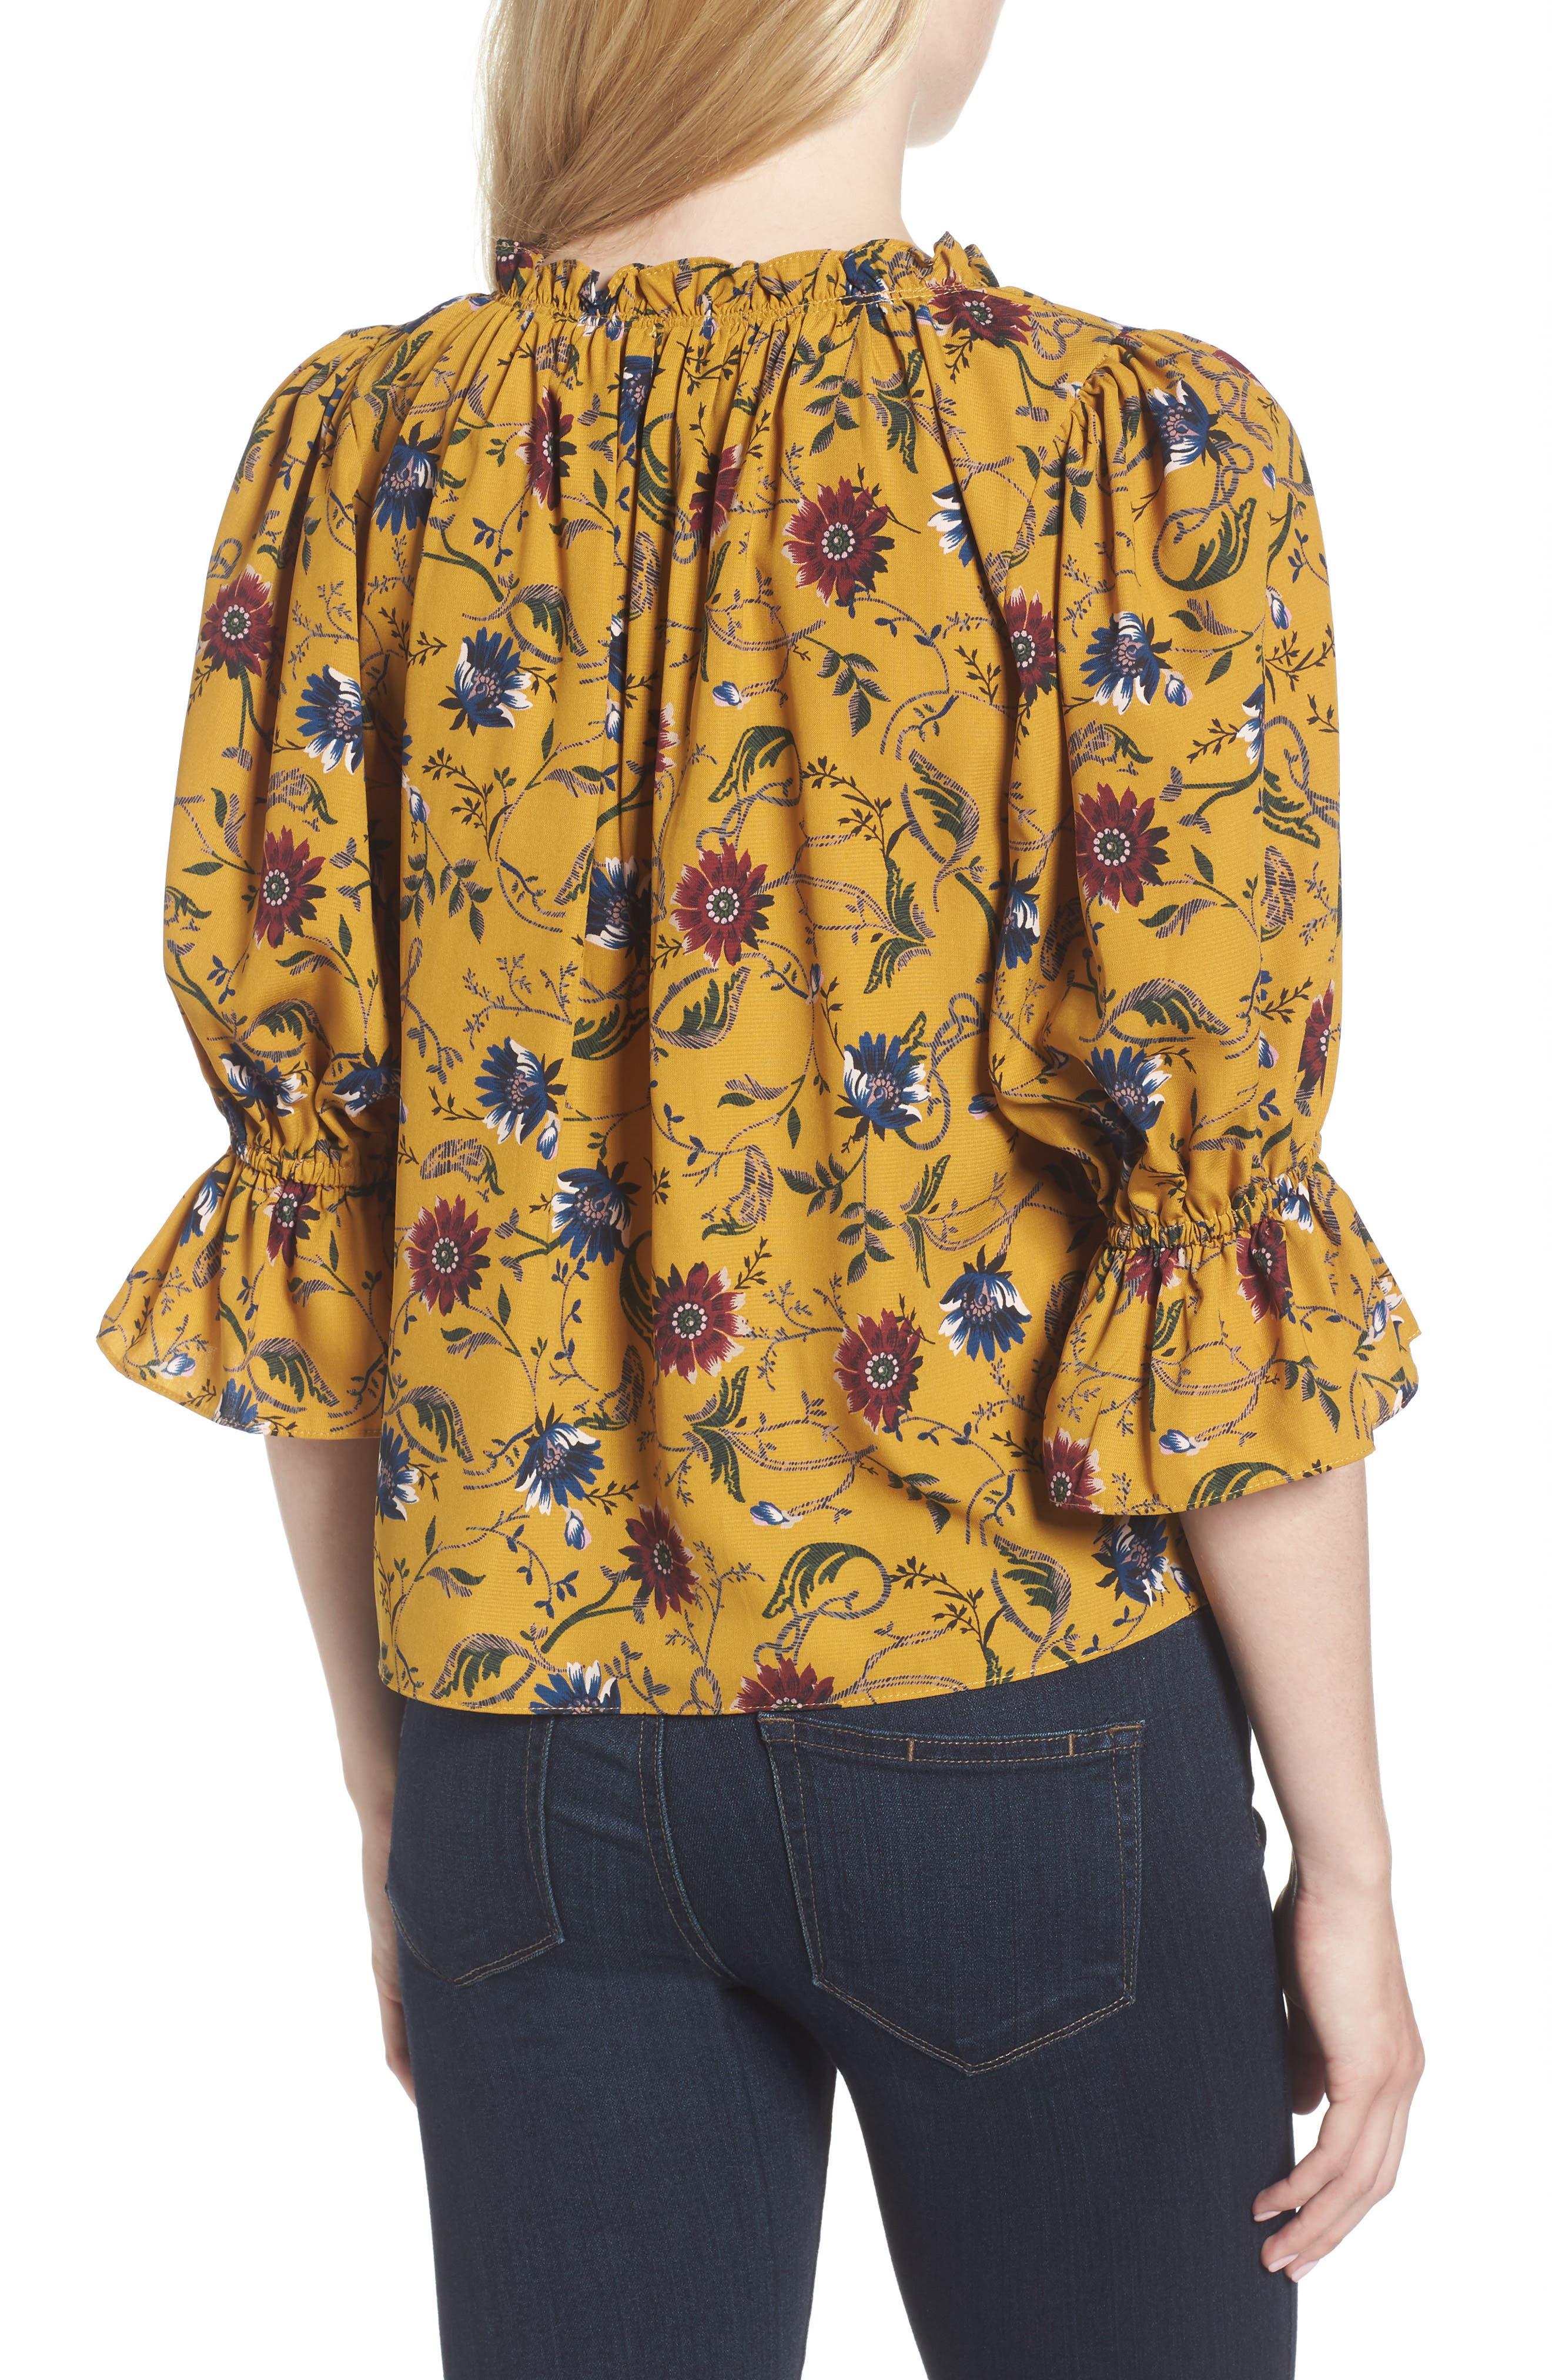 Danee Floral Top,                             Alternate thumbnail 2, color,                             Marigold/ Ivory